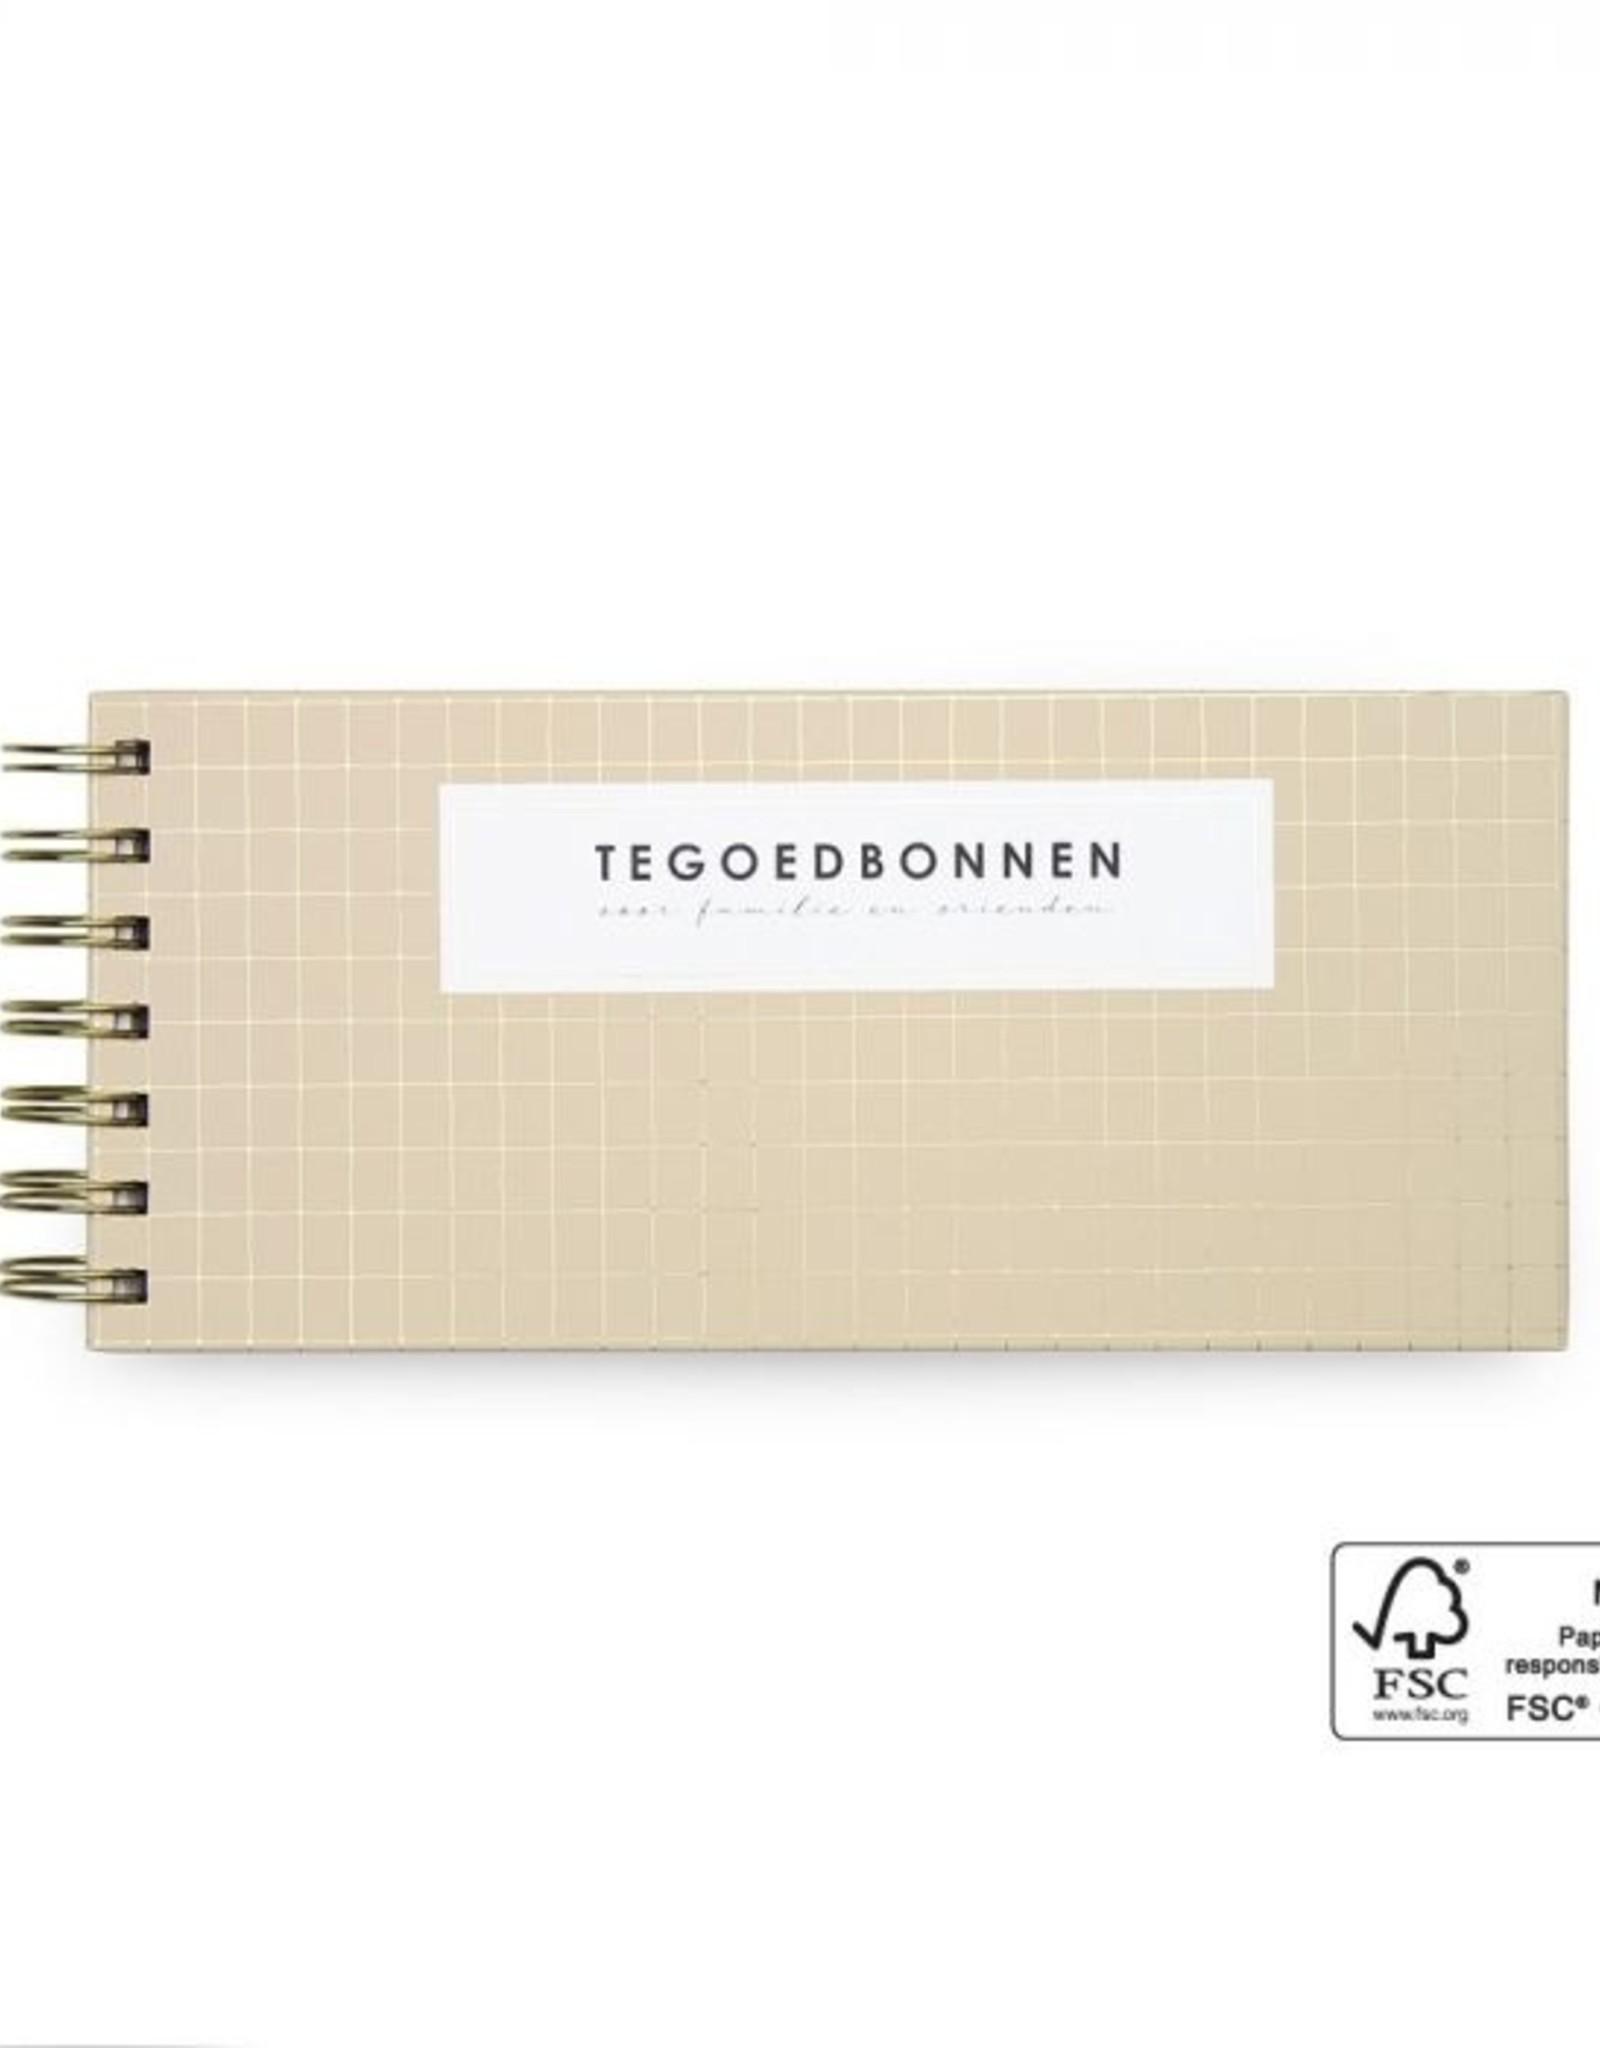 House Of Products HOP-Tegoedbonnen